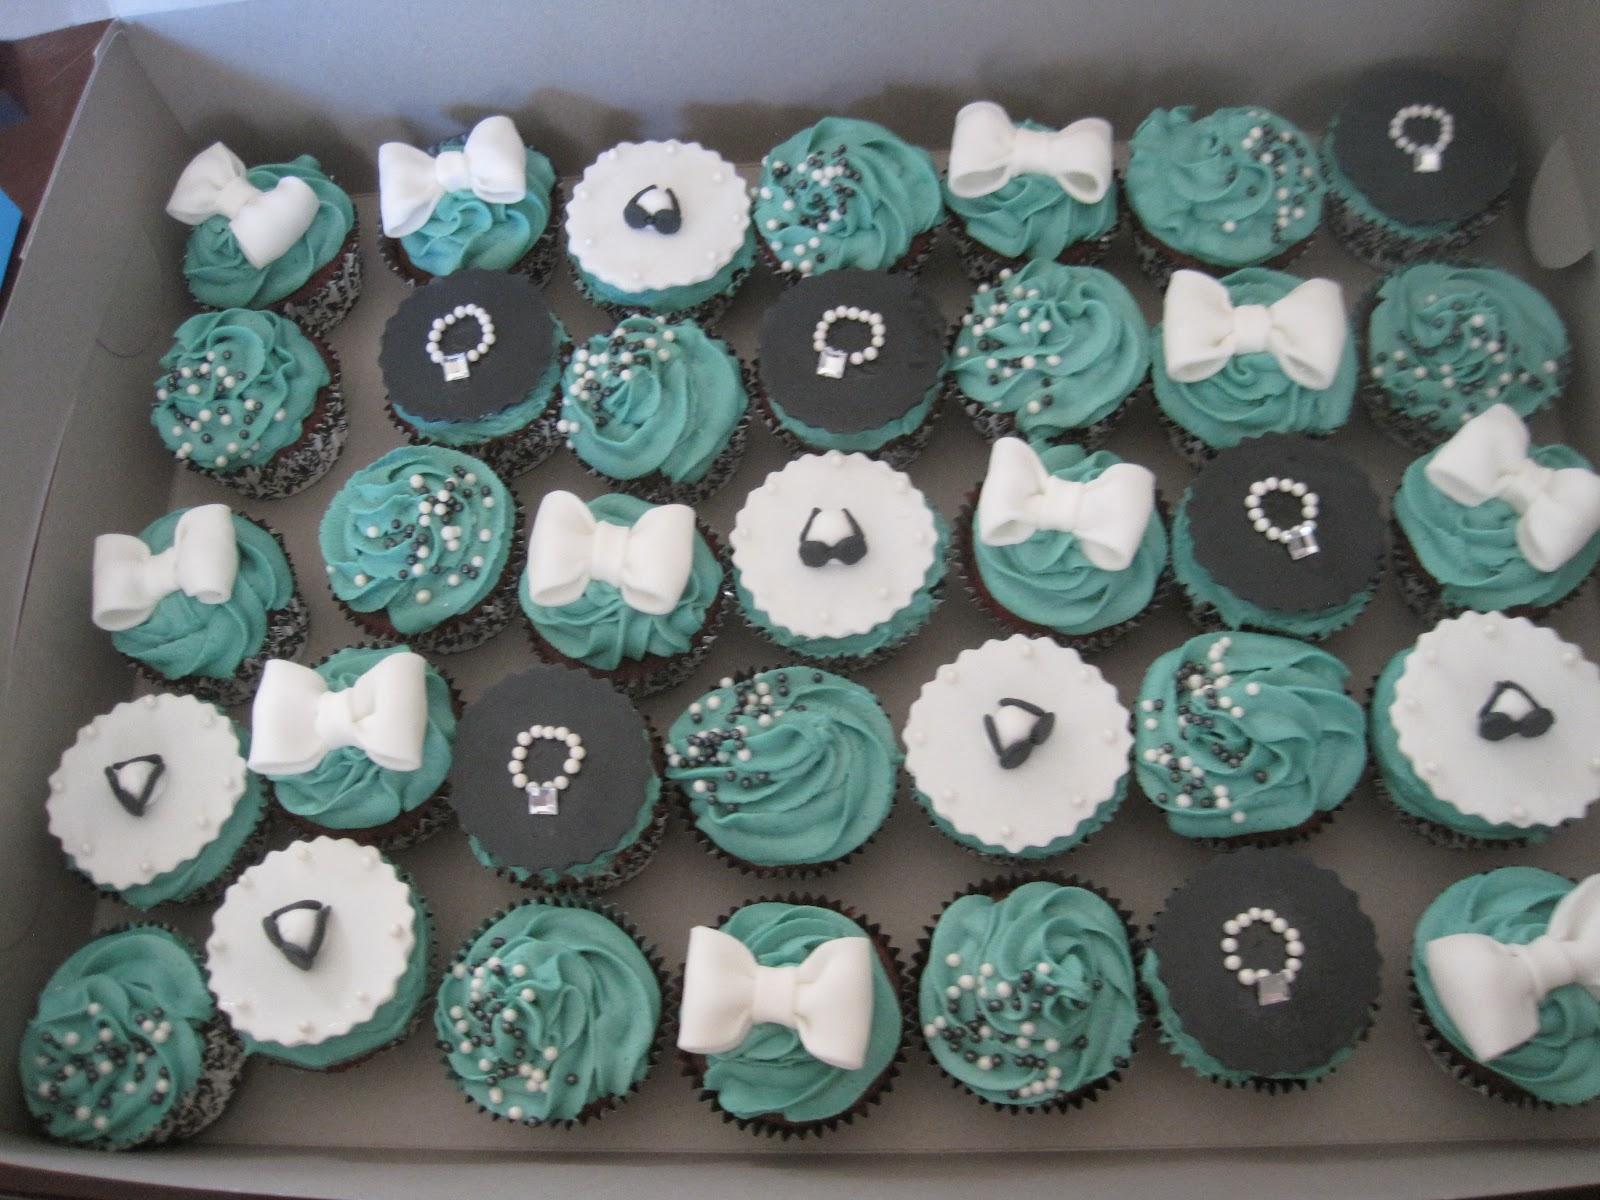 Bridal Shower Cakes   Patisserie Tillemont  Tiffany Bridal Shower Cakes